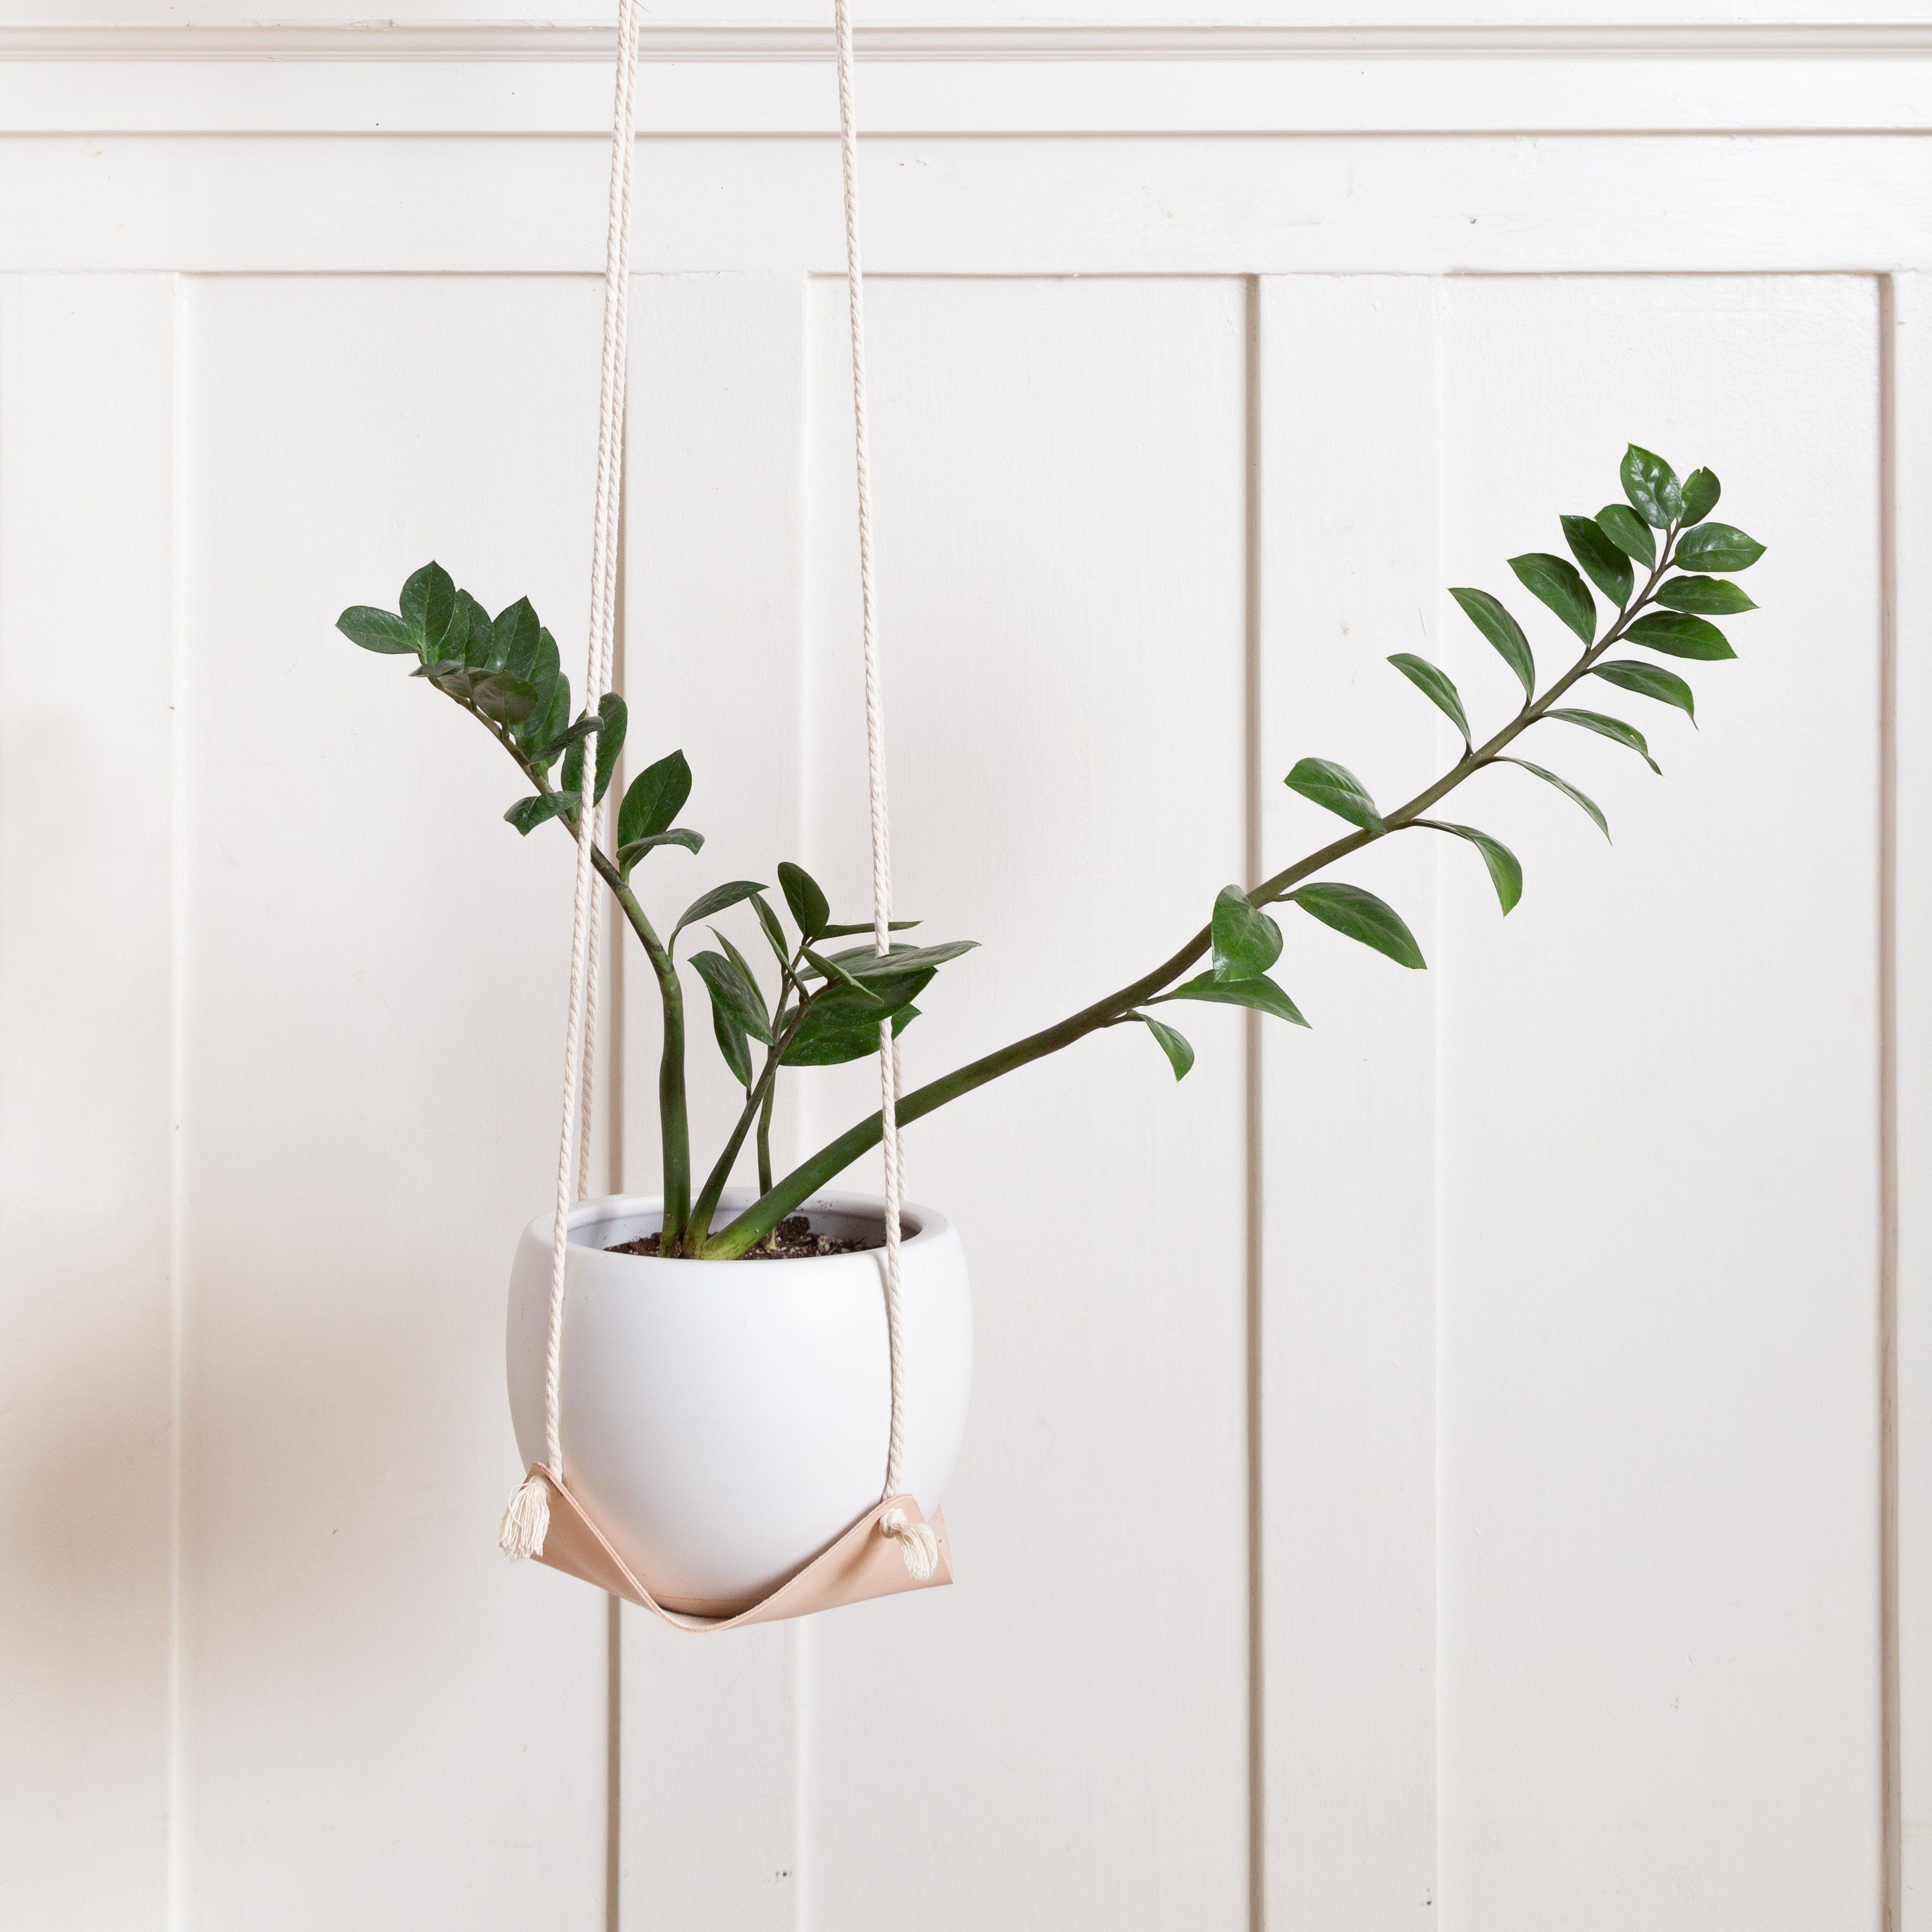 Large Leather Plant Hammock - Veg Tan / Large (8 x 8) / 23